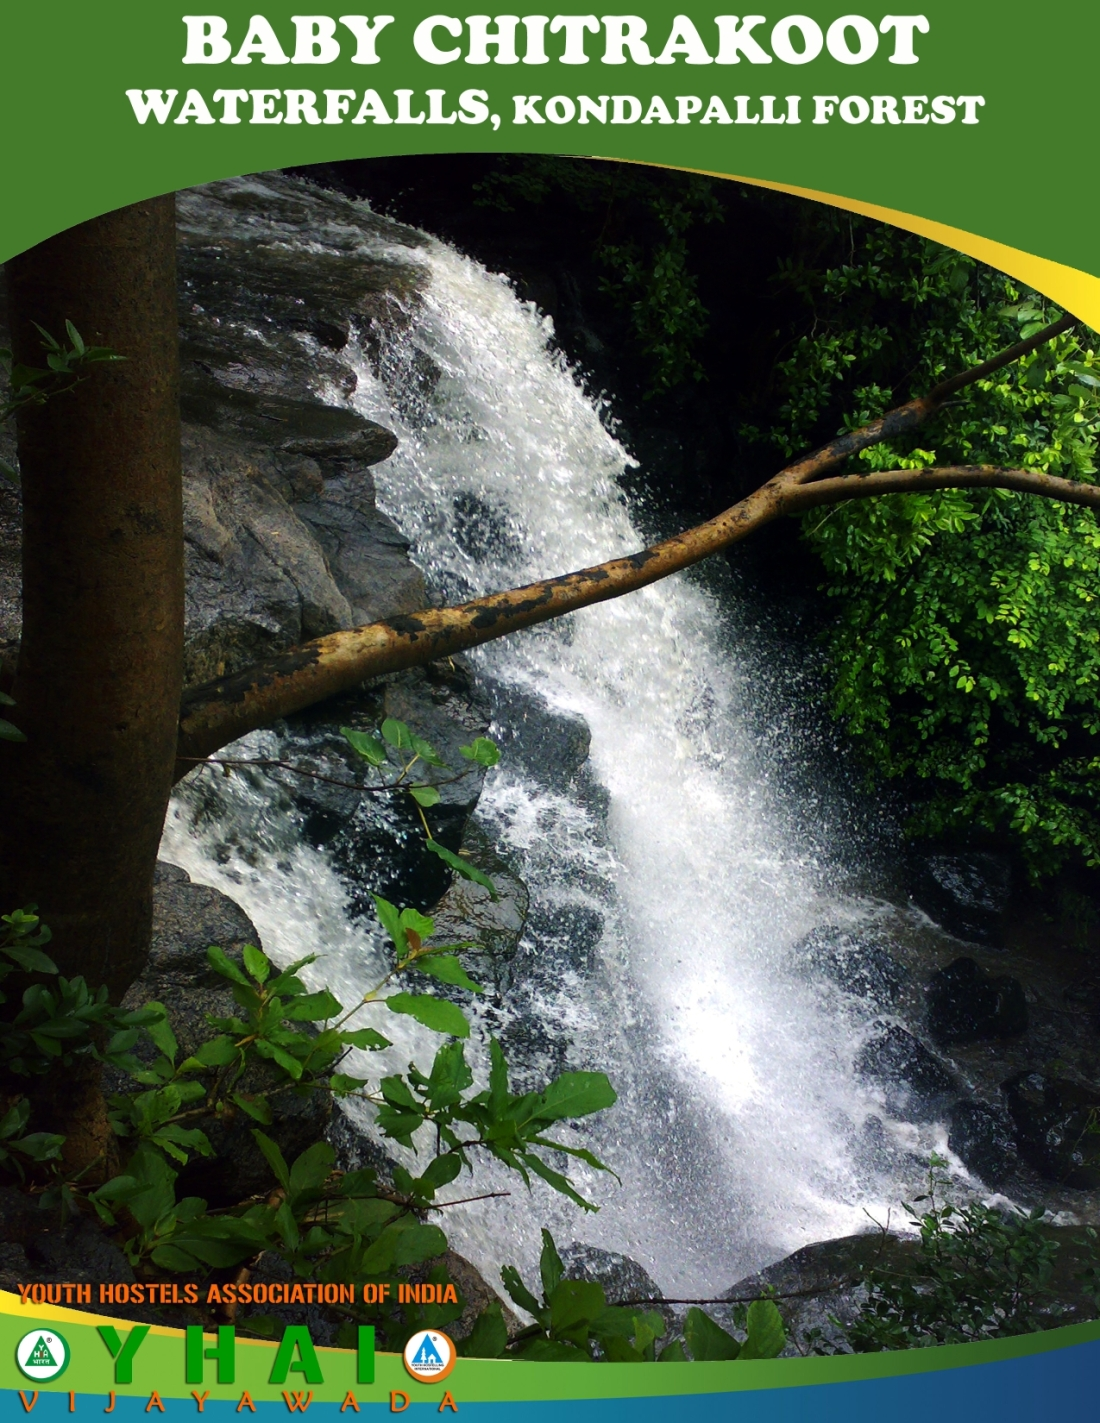 Baby Chitrakoot WaterFalls - Kondapalli Forest